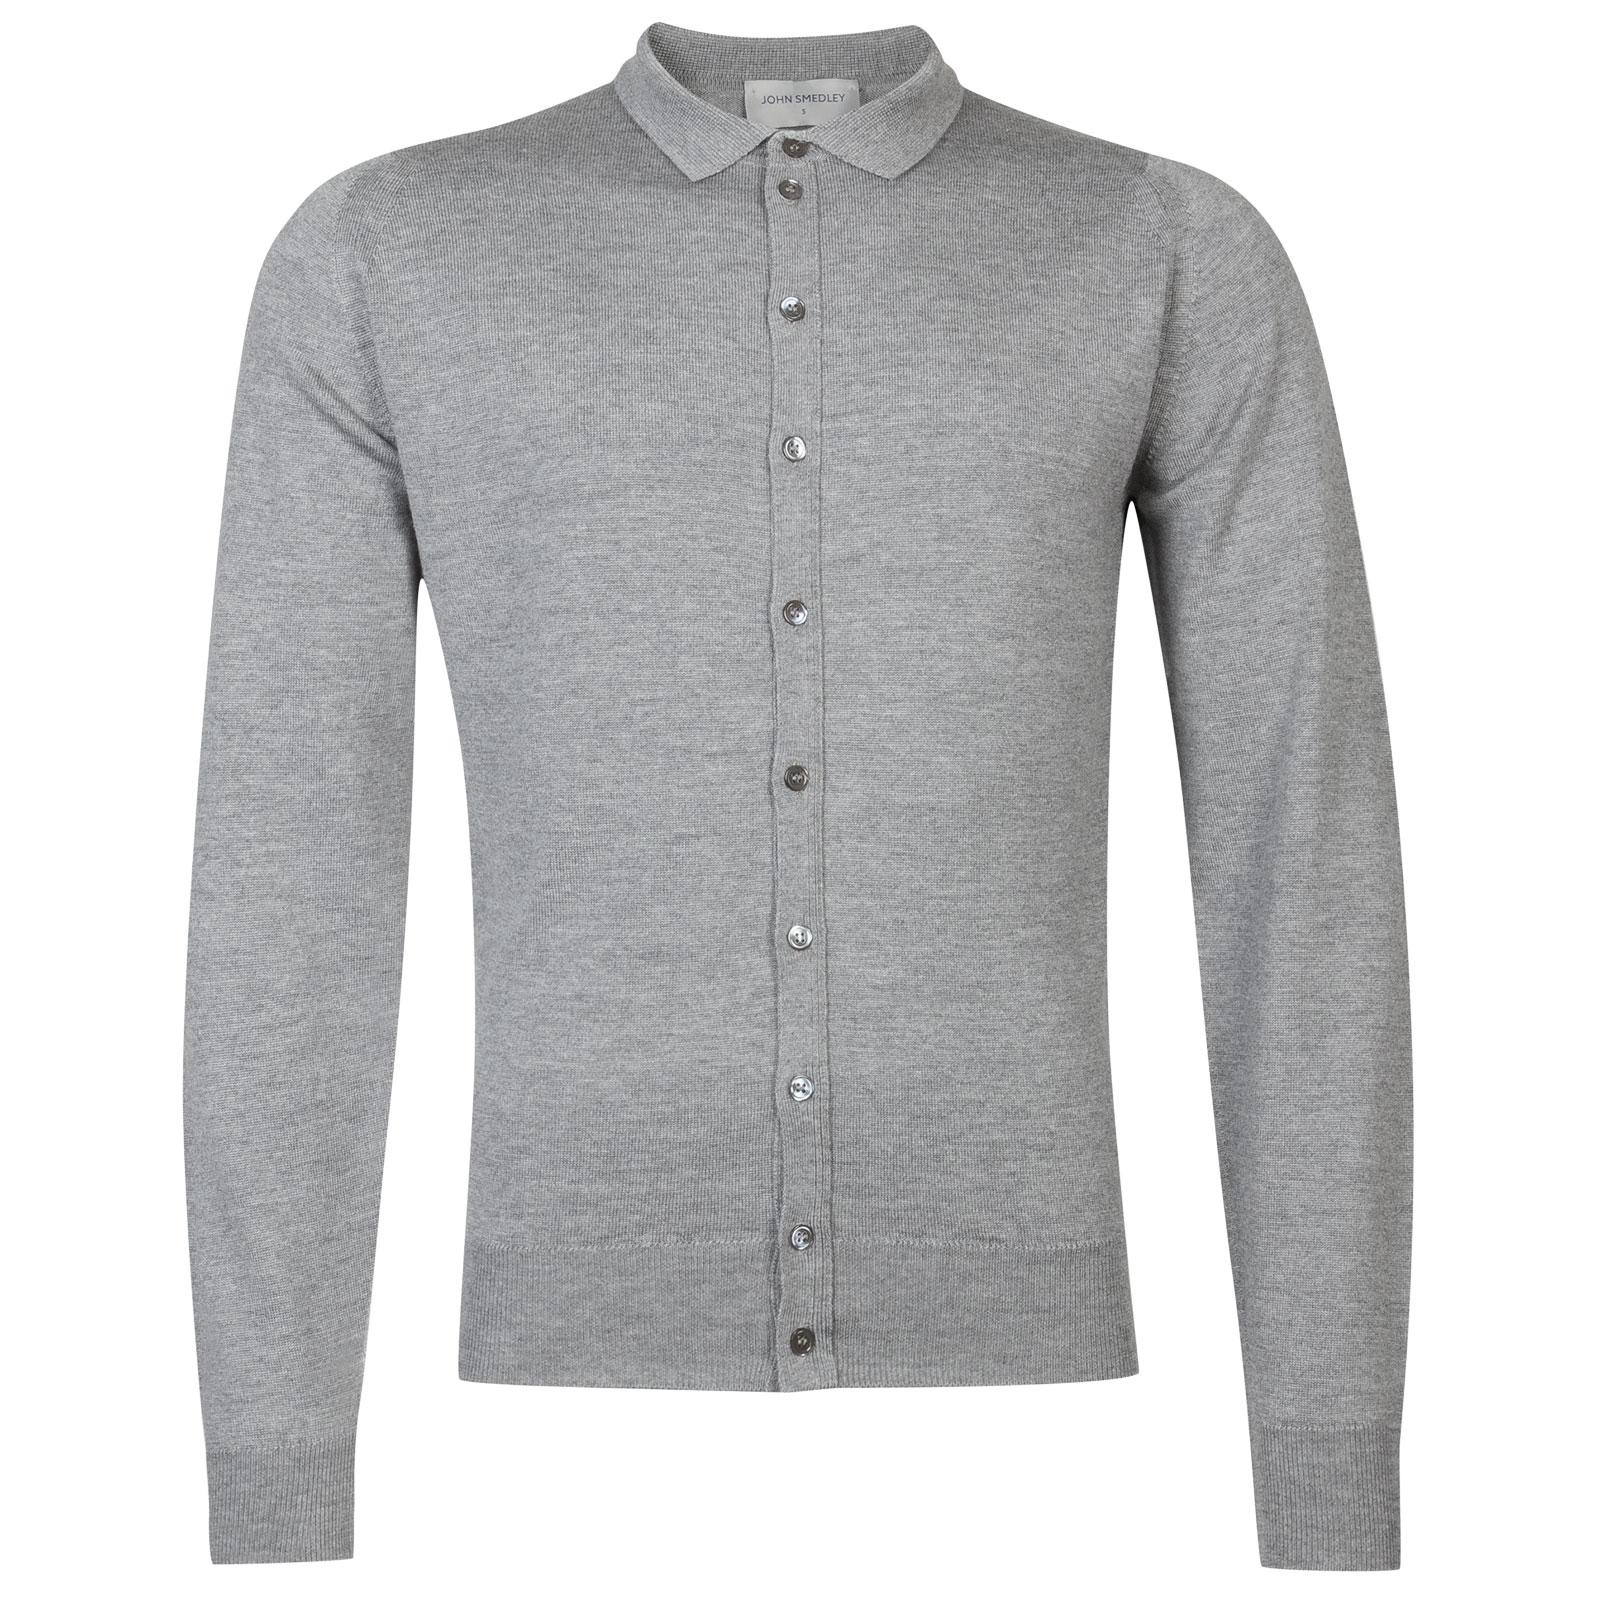 John Smedley parwish Merino Wool Shirt in Silver-XXL